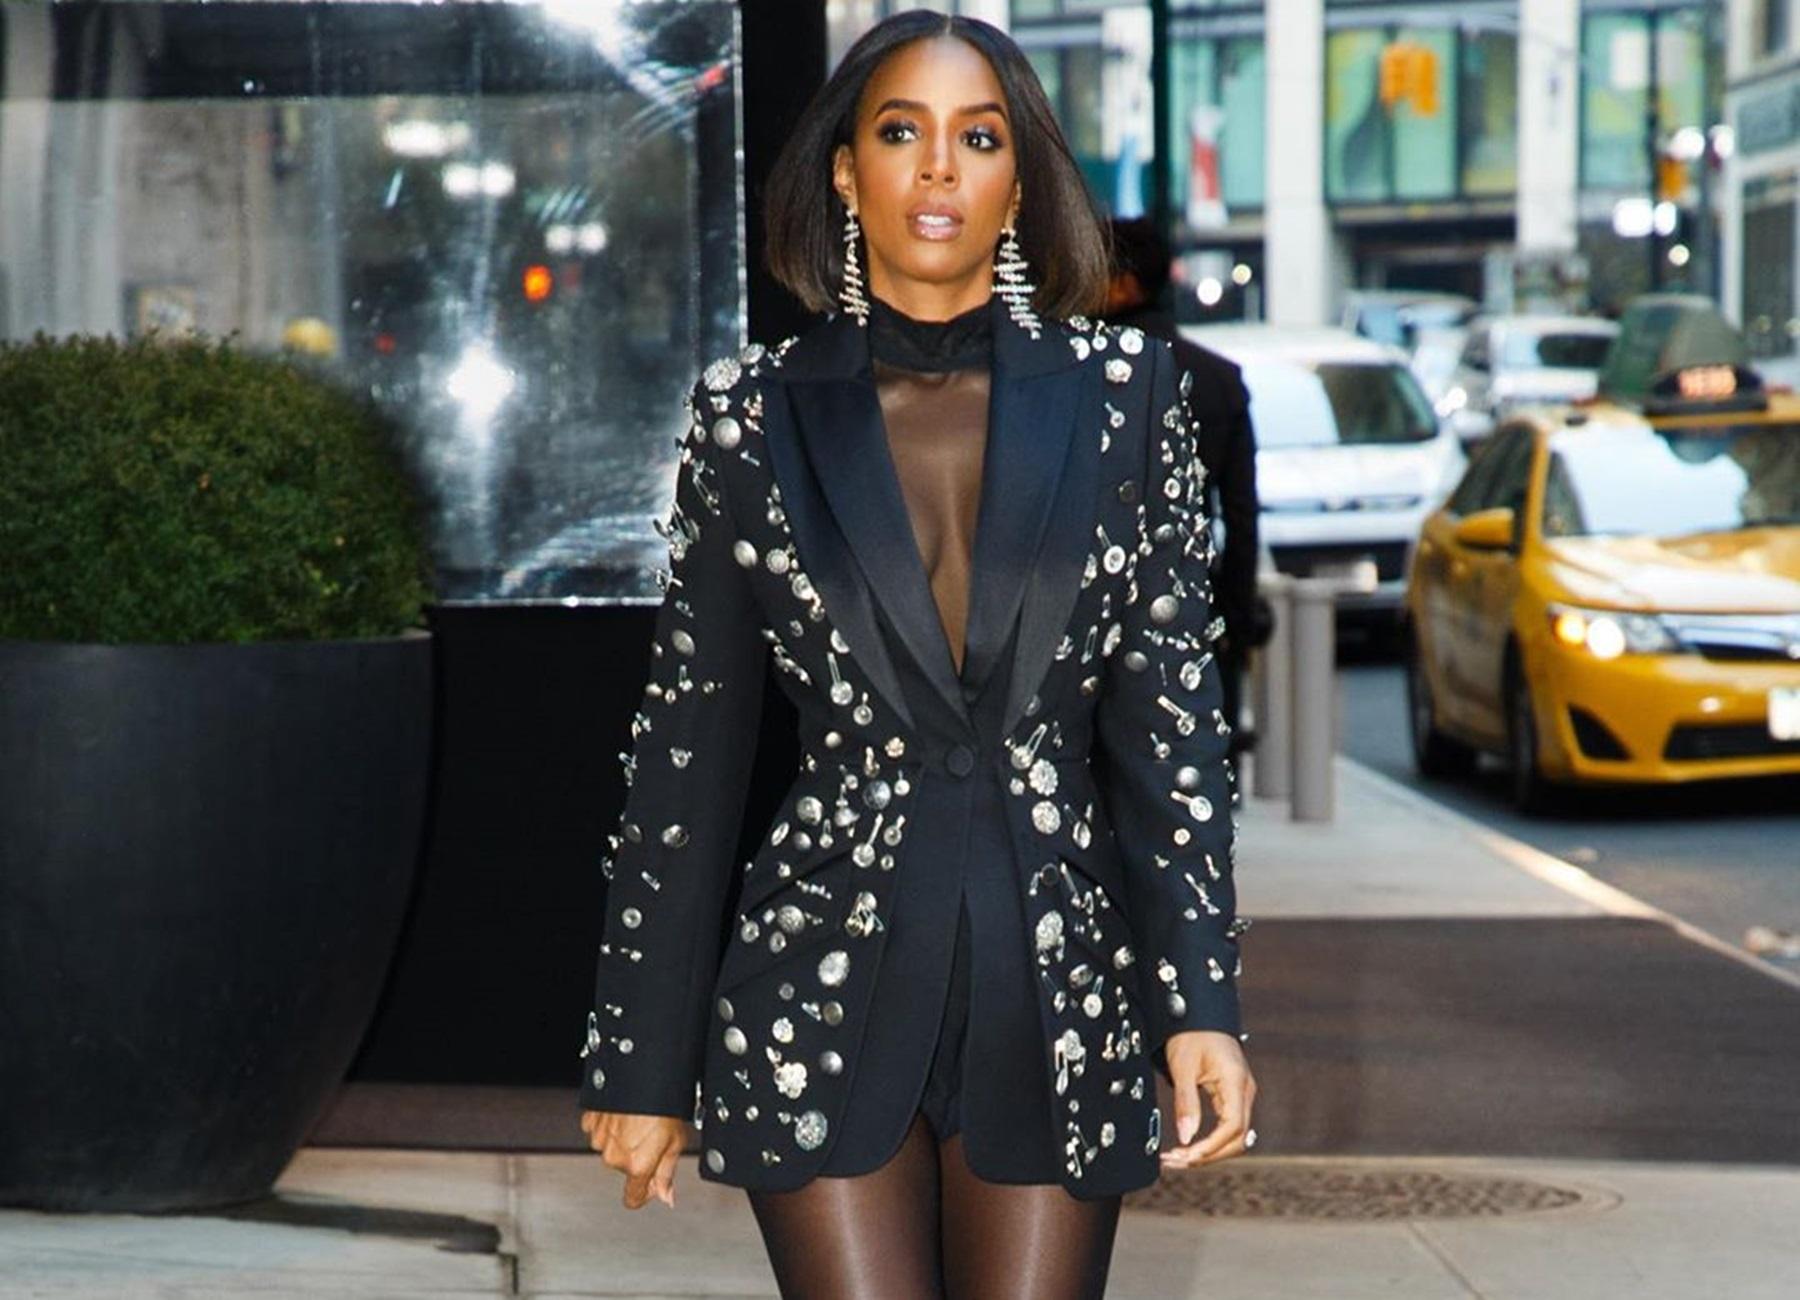 Kelly Rowland NeNe Leakes RHOA